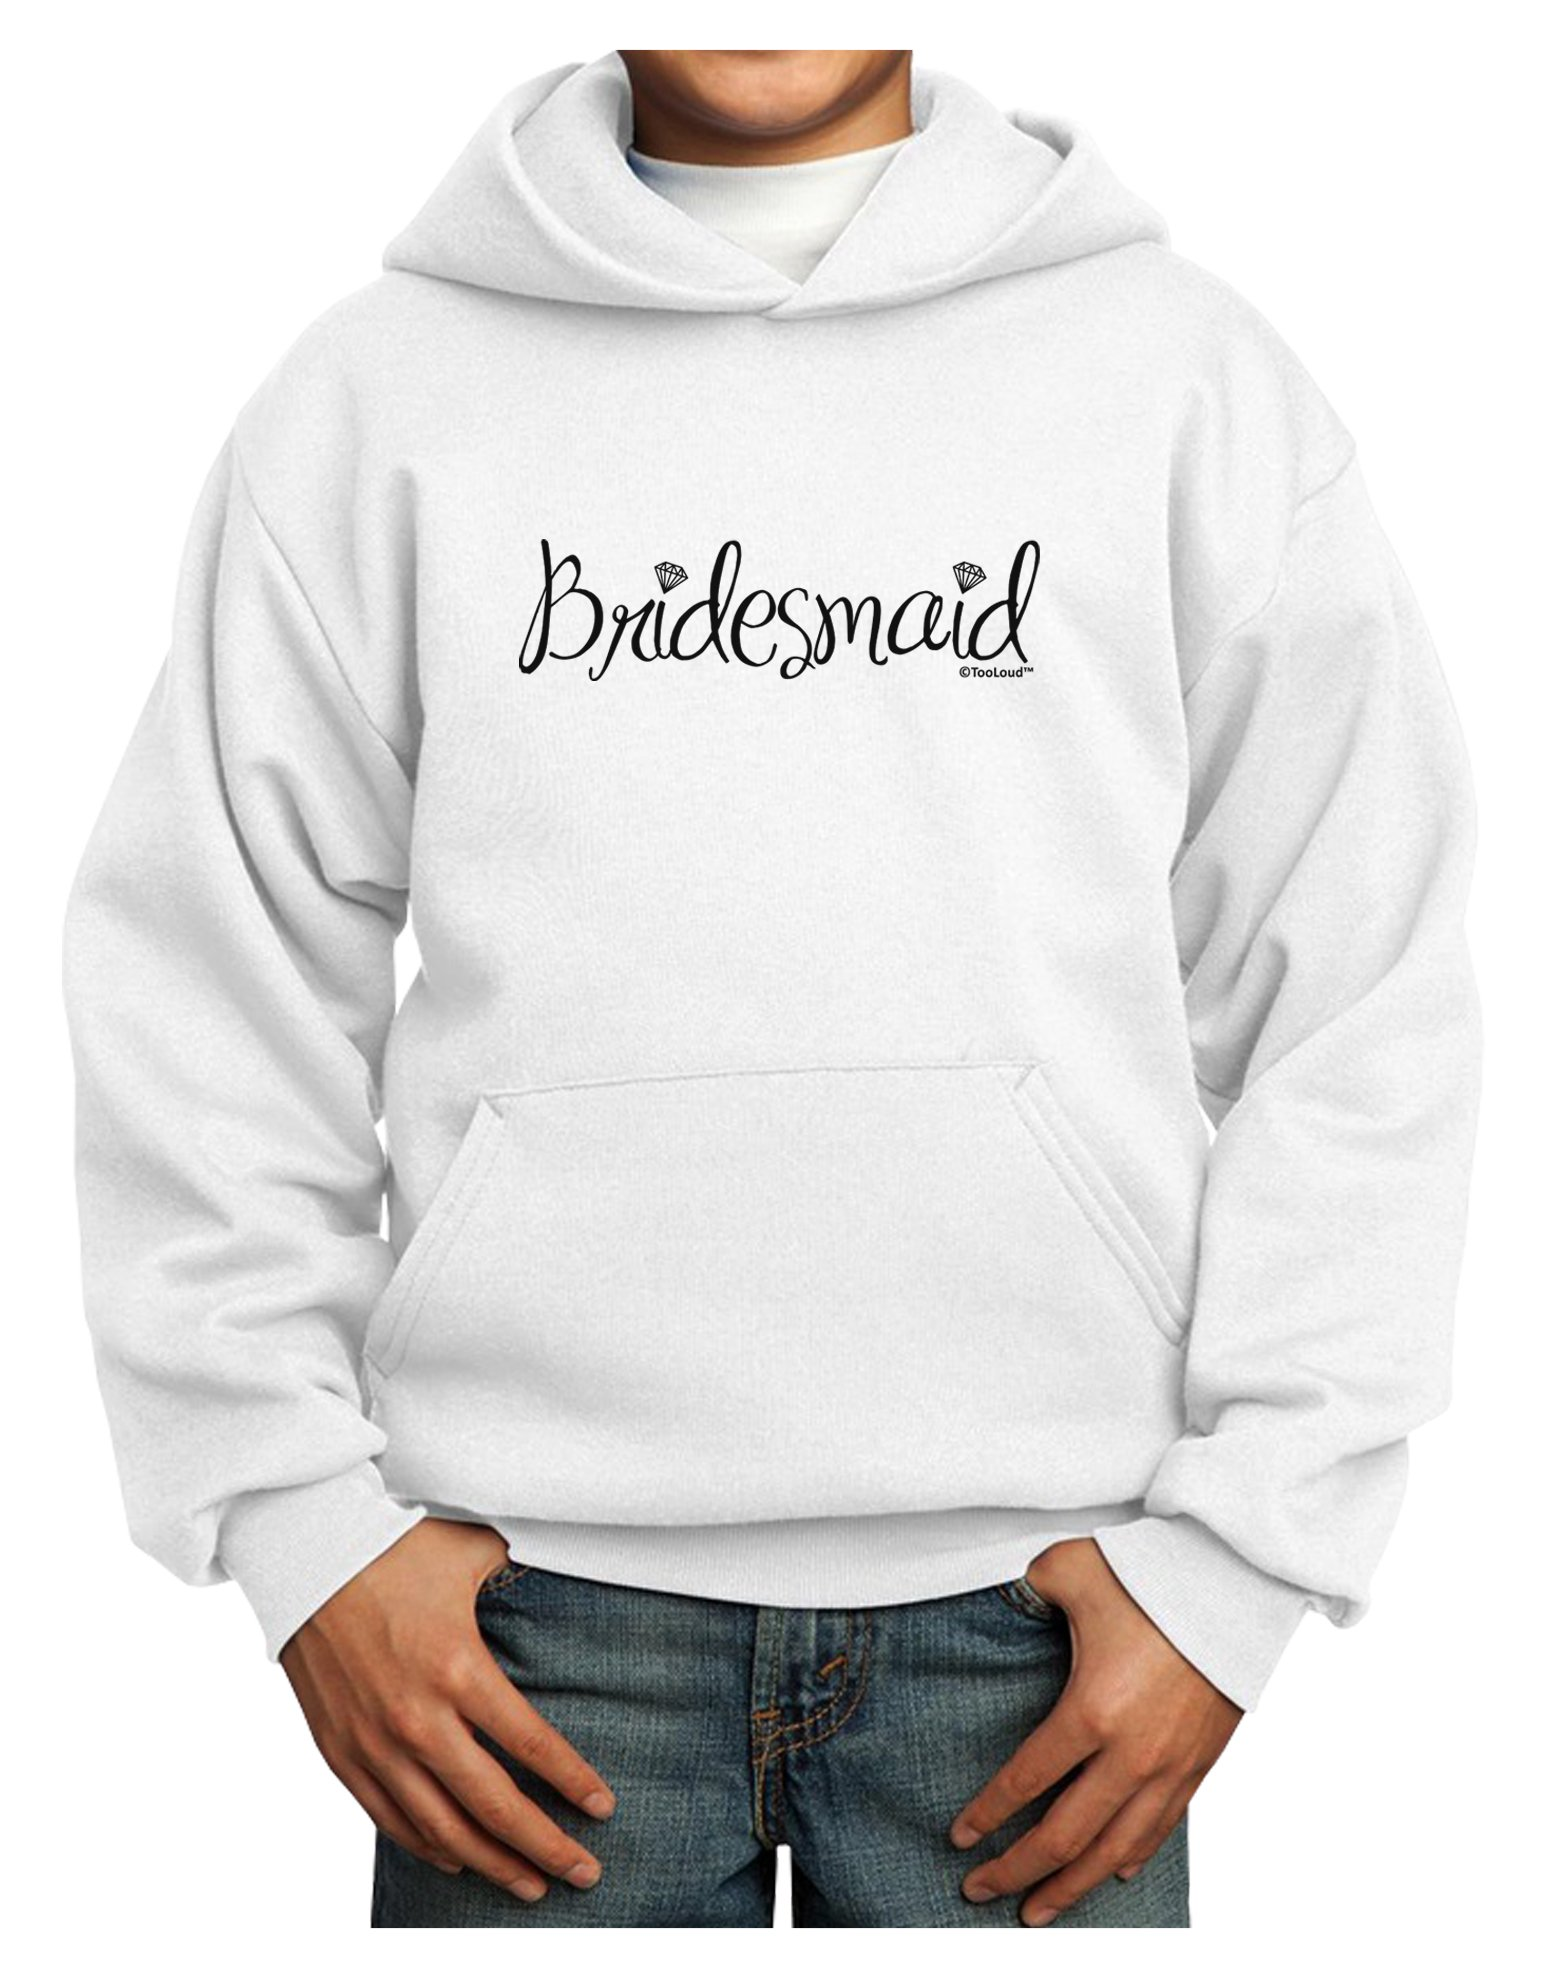 TooLoud Bridesmaid Design - Diamonds Youth Hoodie White Large